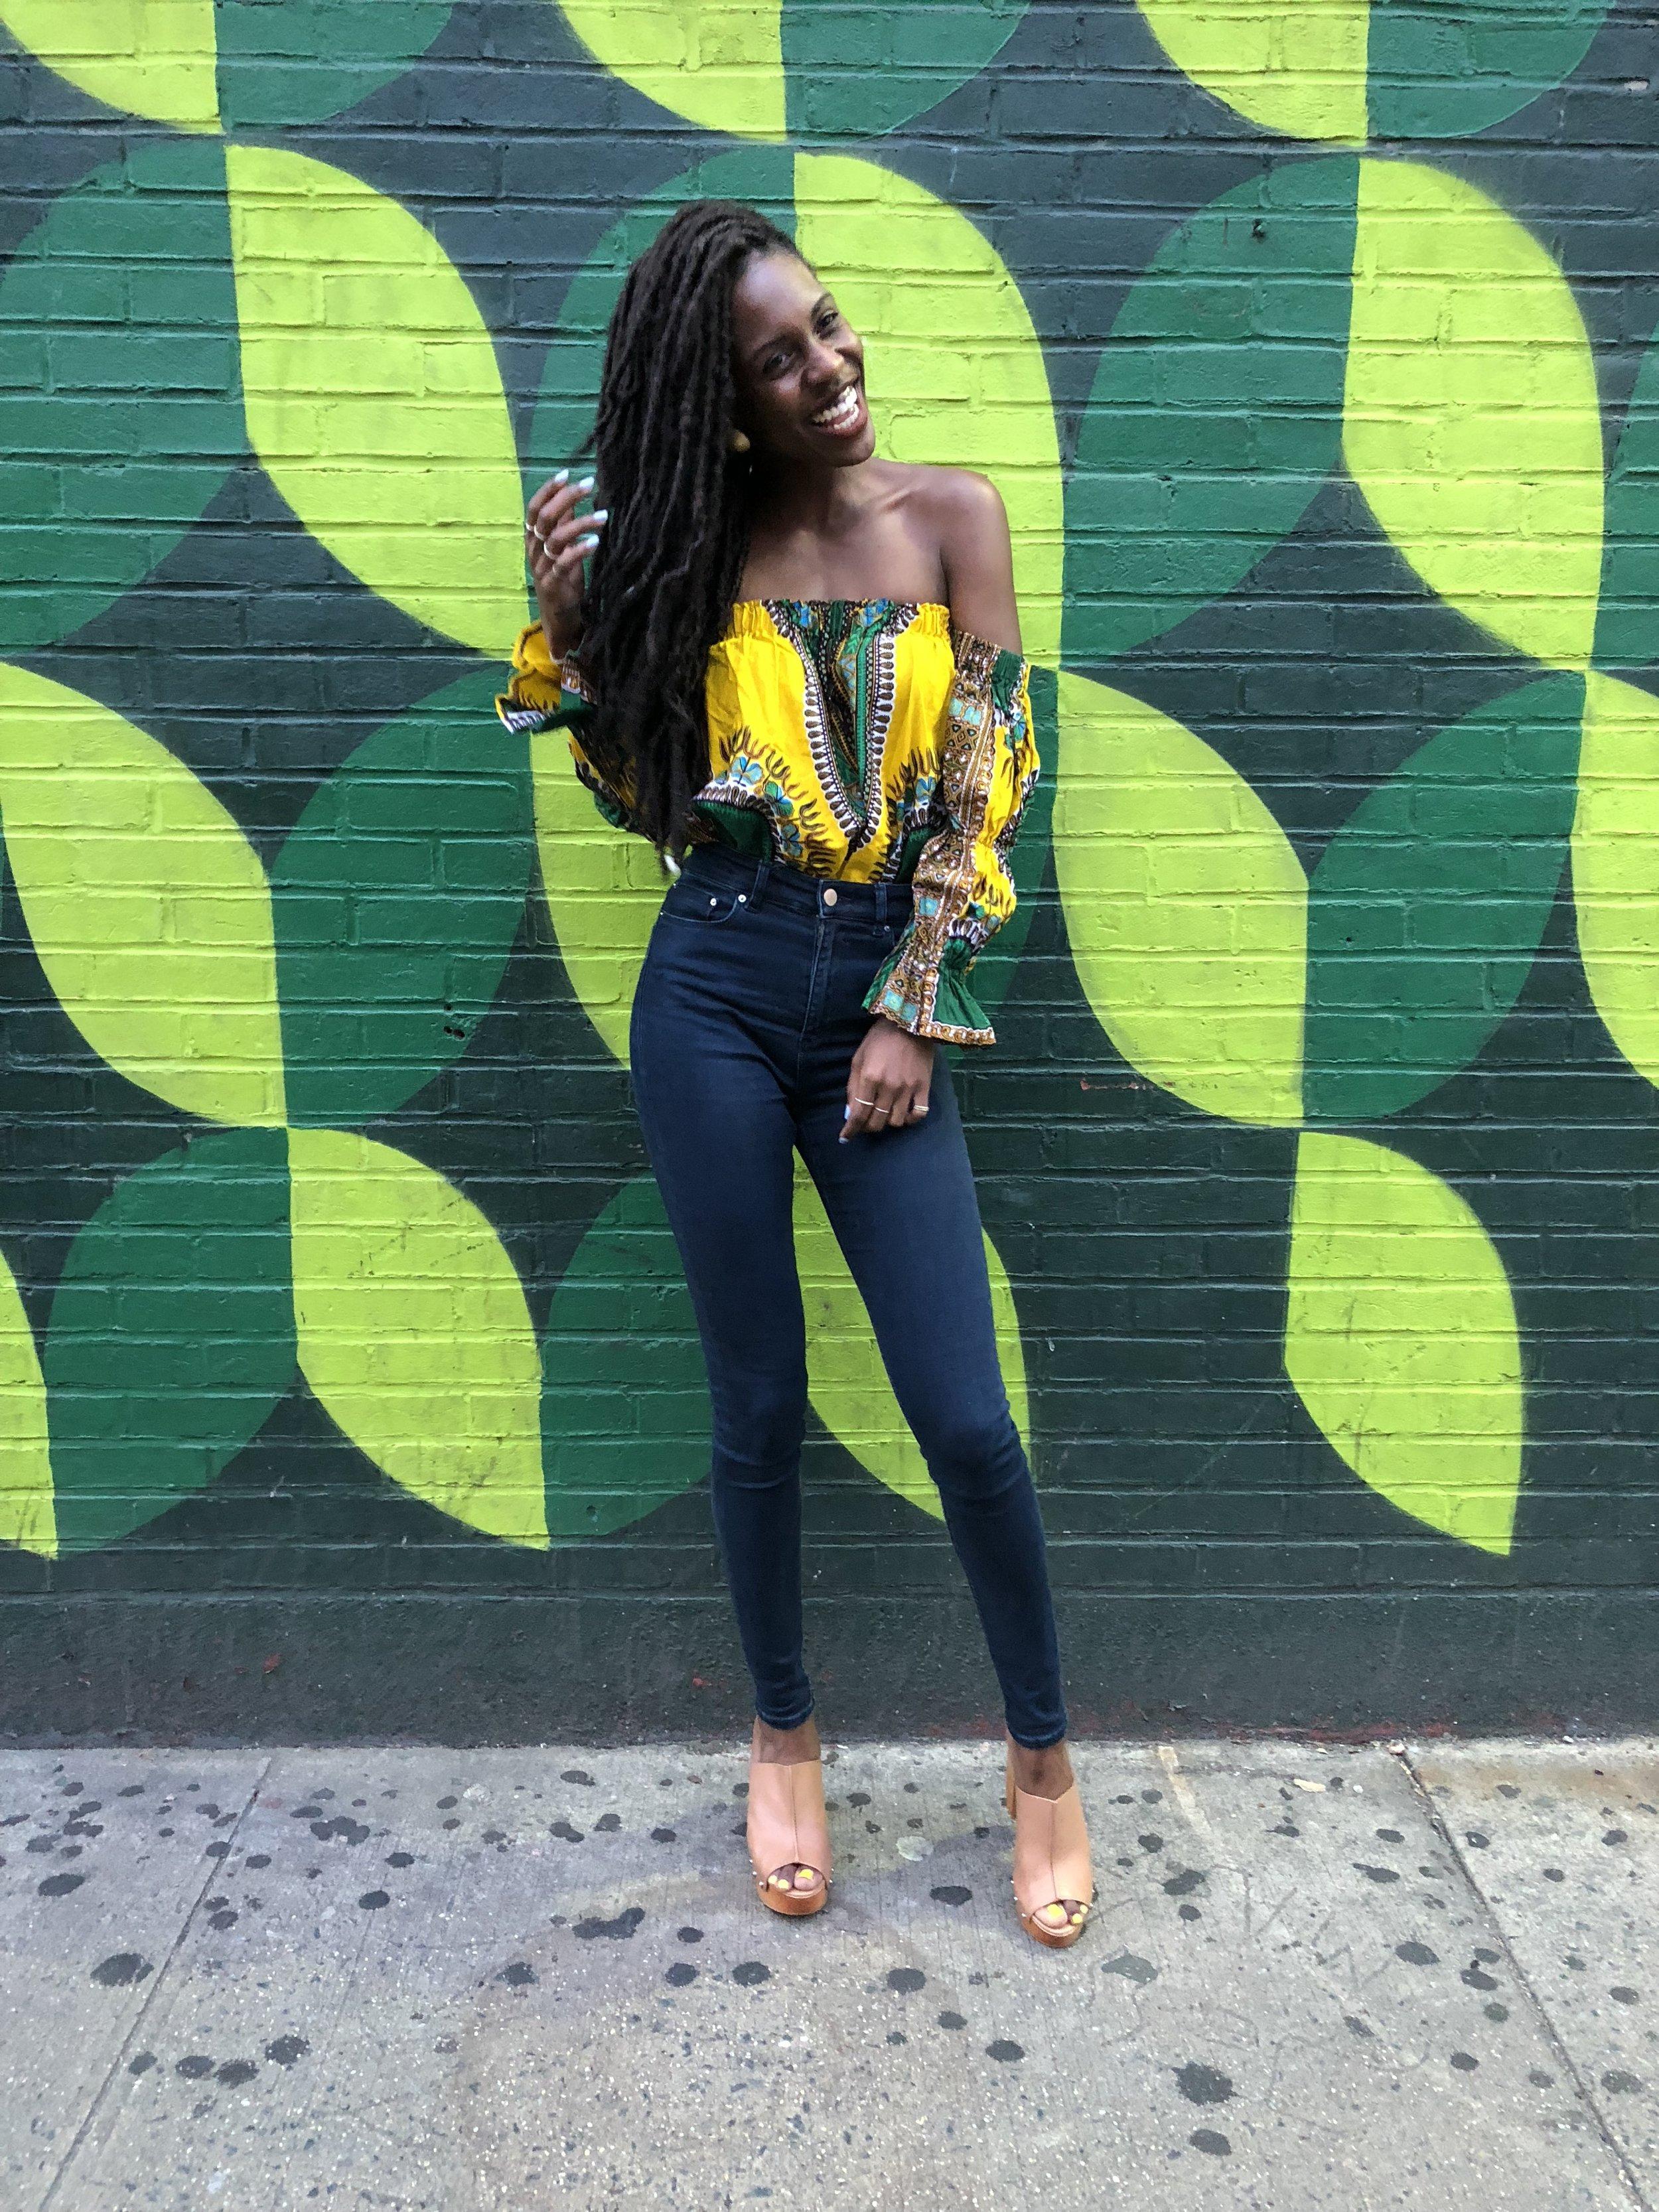 Vero Moda Jeans from ASOS Tall